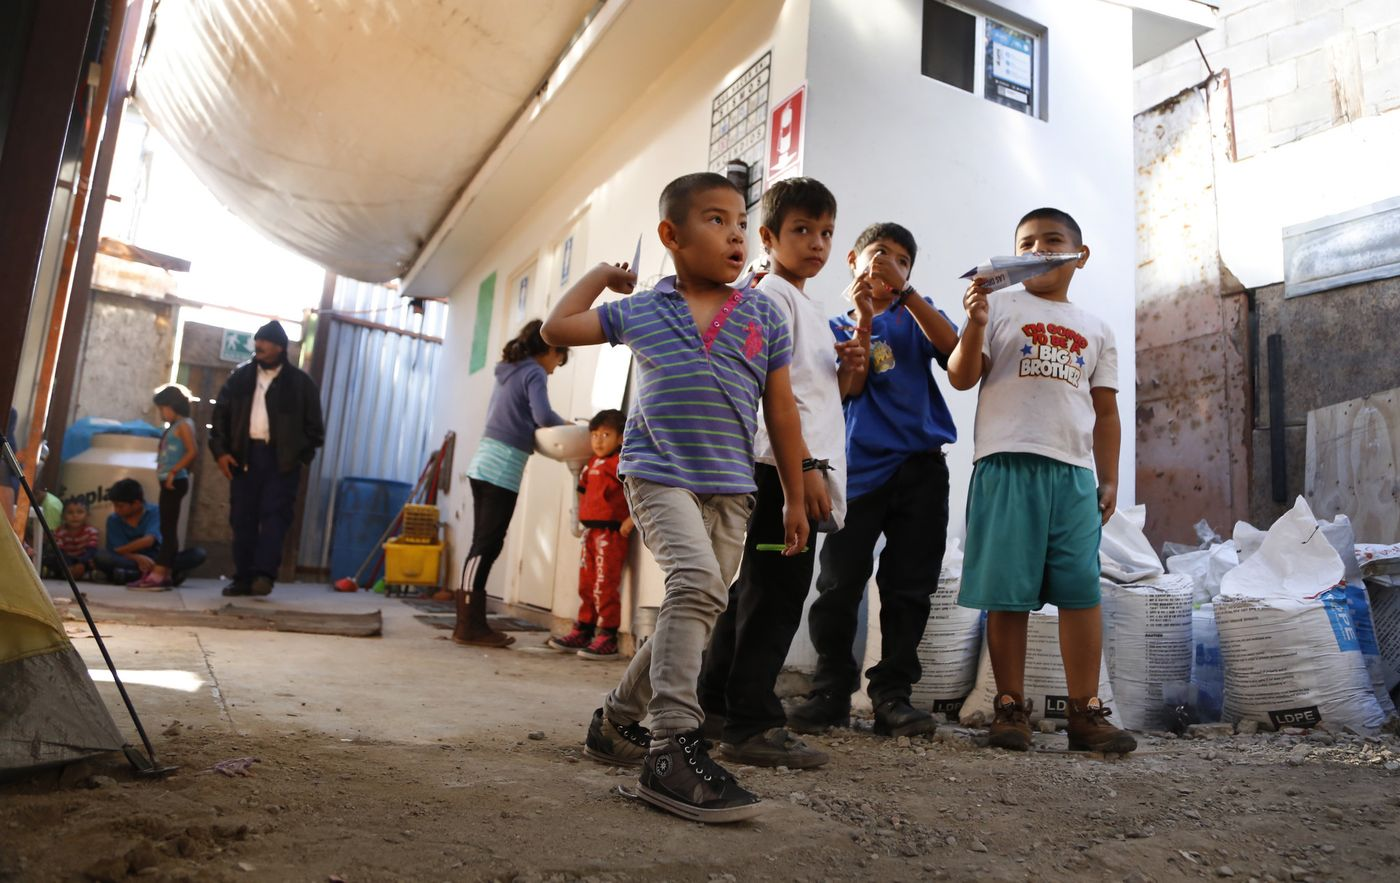 sd-tijuana-shelter-20181020-008.jpg